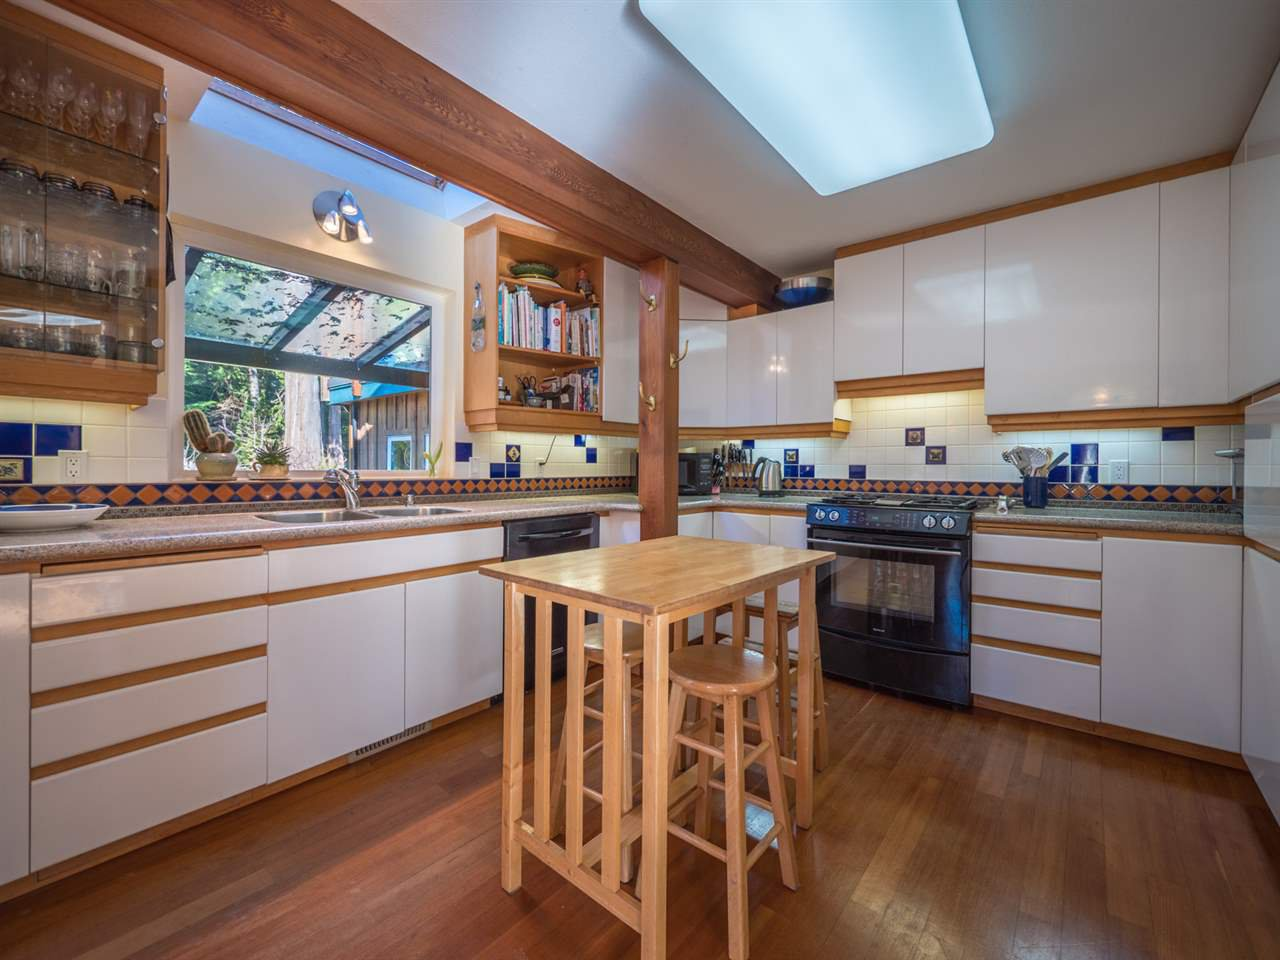 Photo 5: Photos: 3592 BEACH Avenue: Roberts Creek House for sale (Sunshine Coast)  : MLS®# R2244747